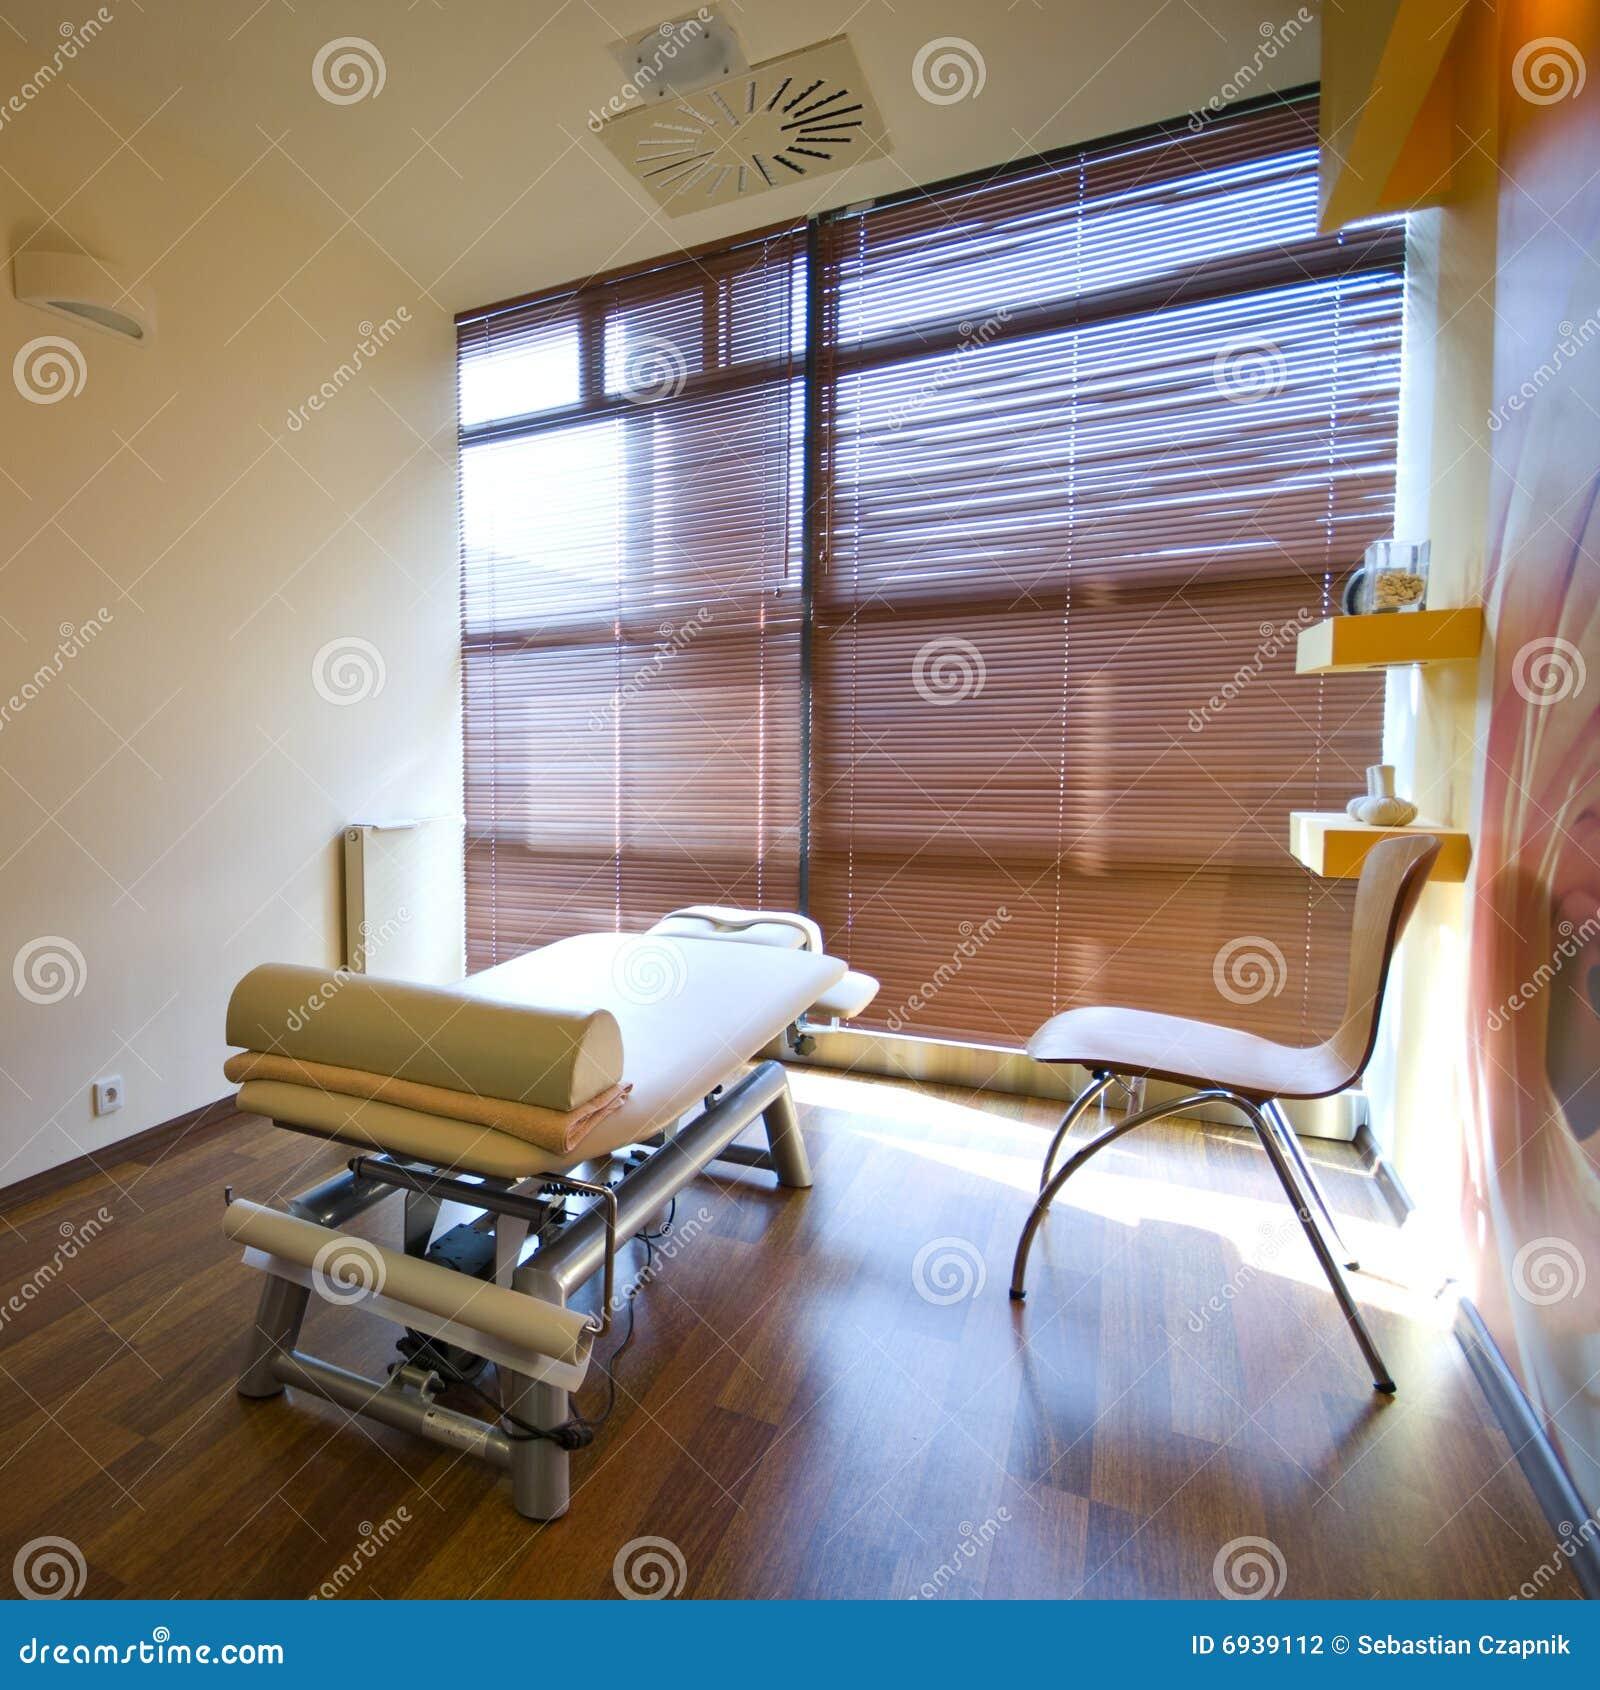 Bed massage room spa